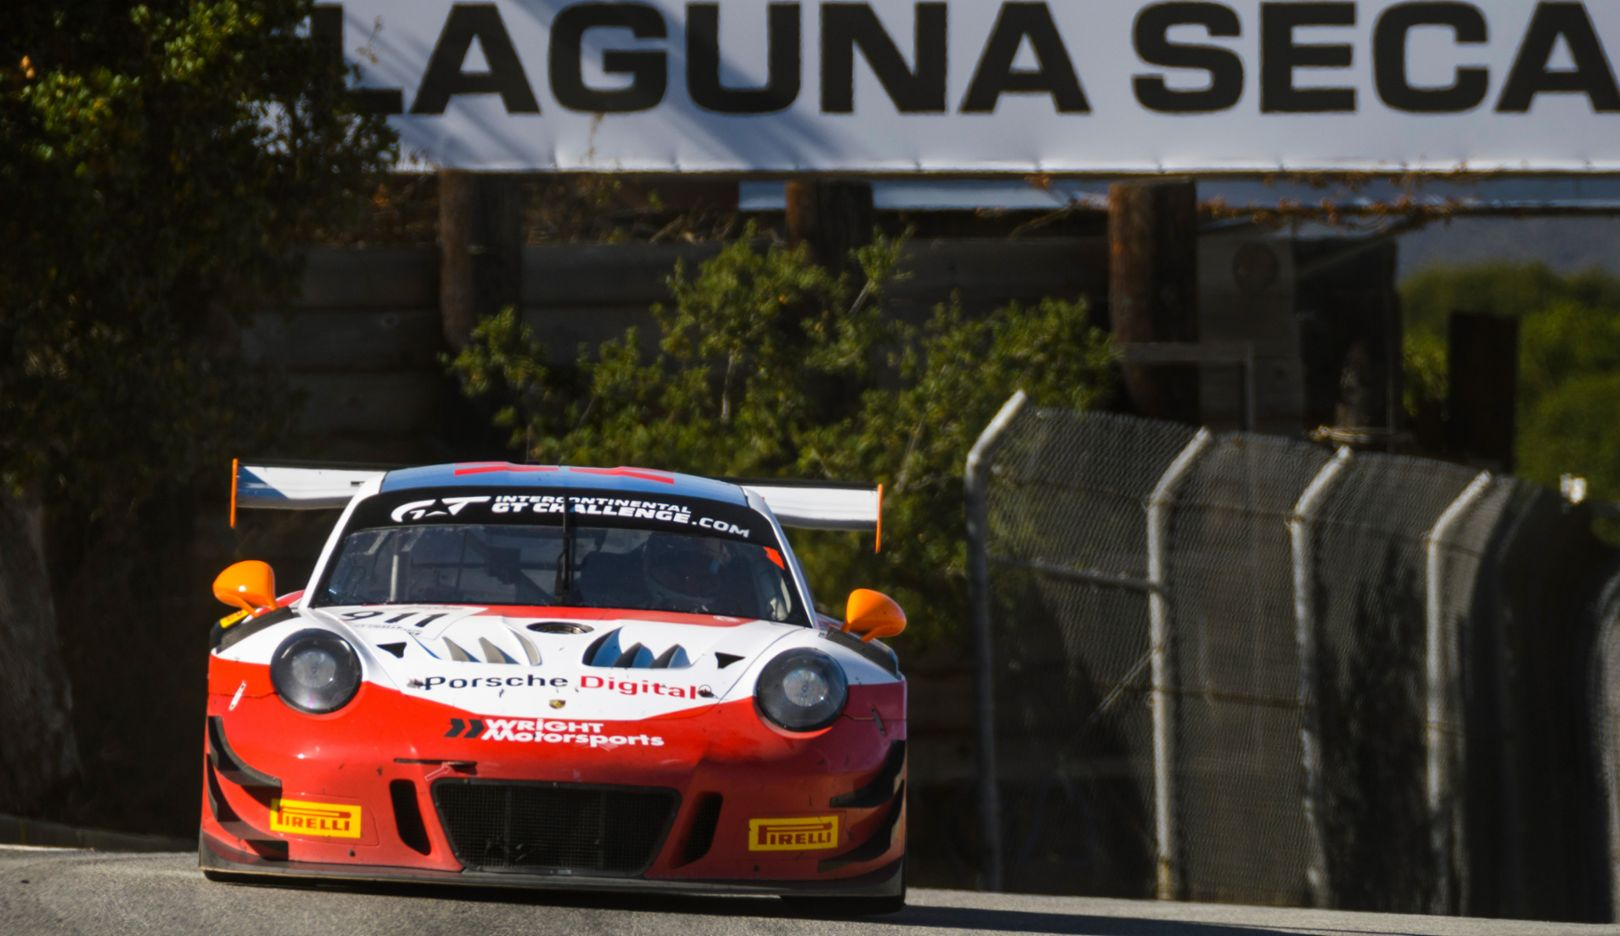 911 GT3 R, Wright Motorsports, 4. Lauf, Laguna Seca, 2018, Porsche AG